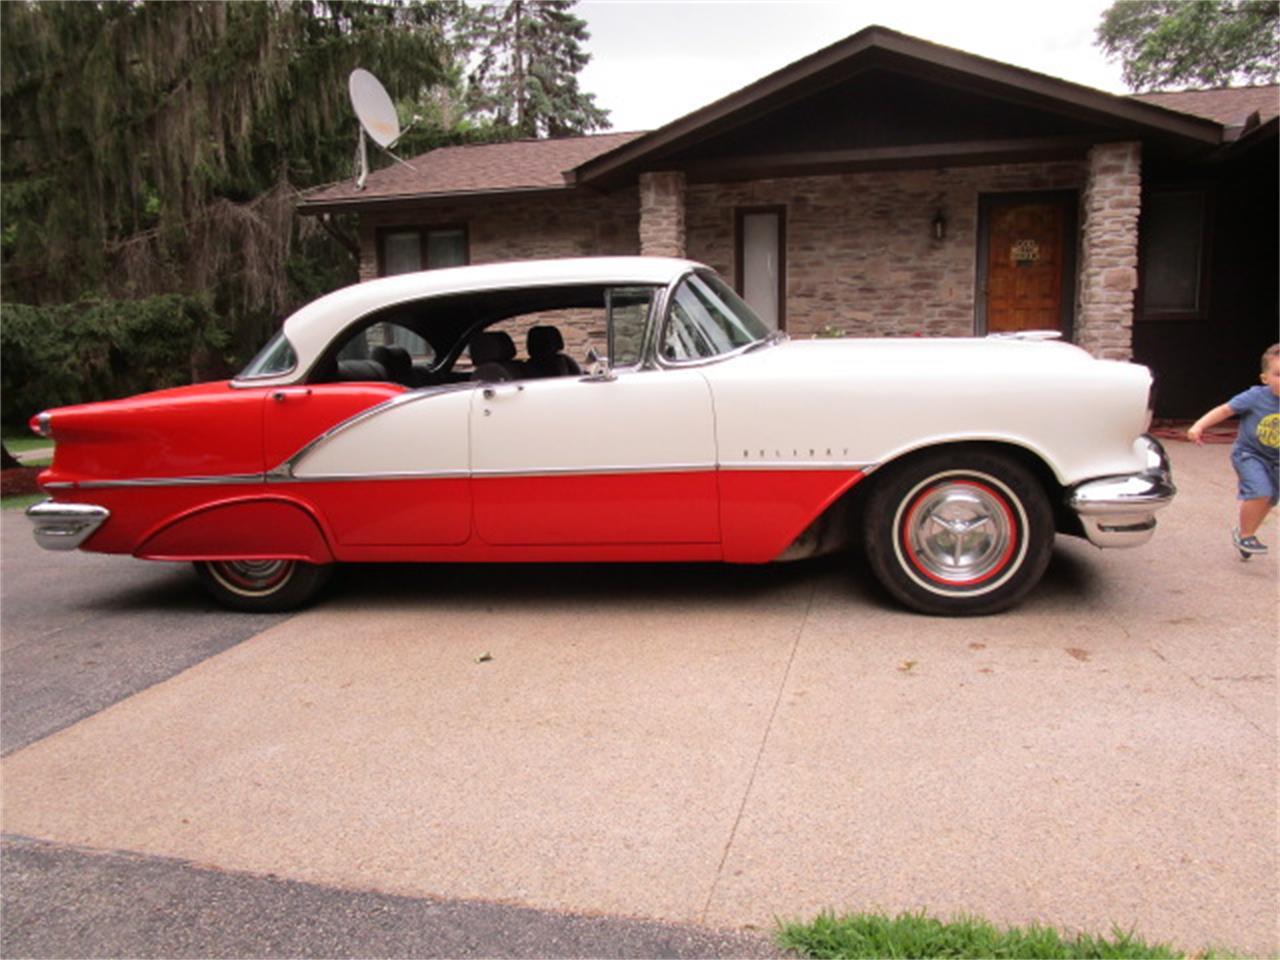 for sale 1956 oldsmobile holiday in dodge center, minnesota cars - dodge center, mn at geebo